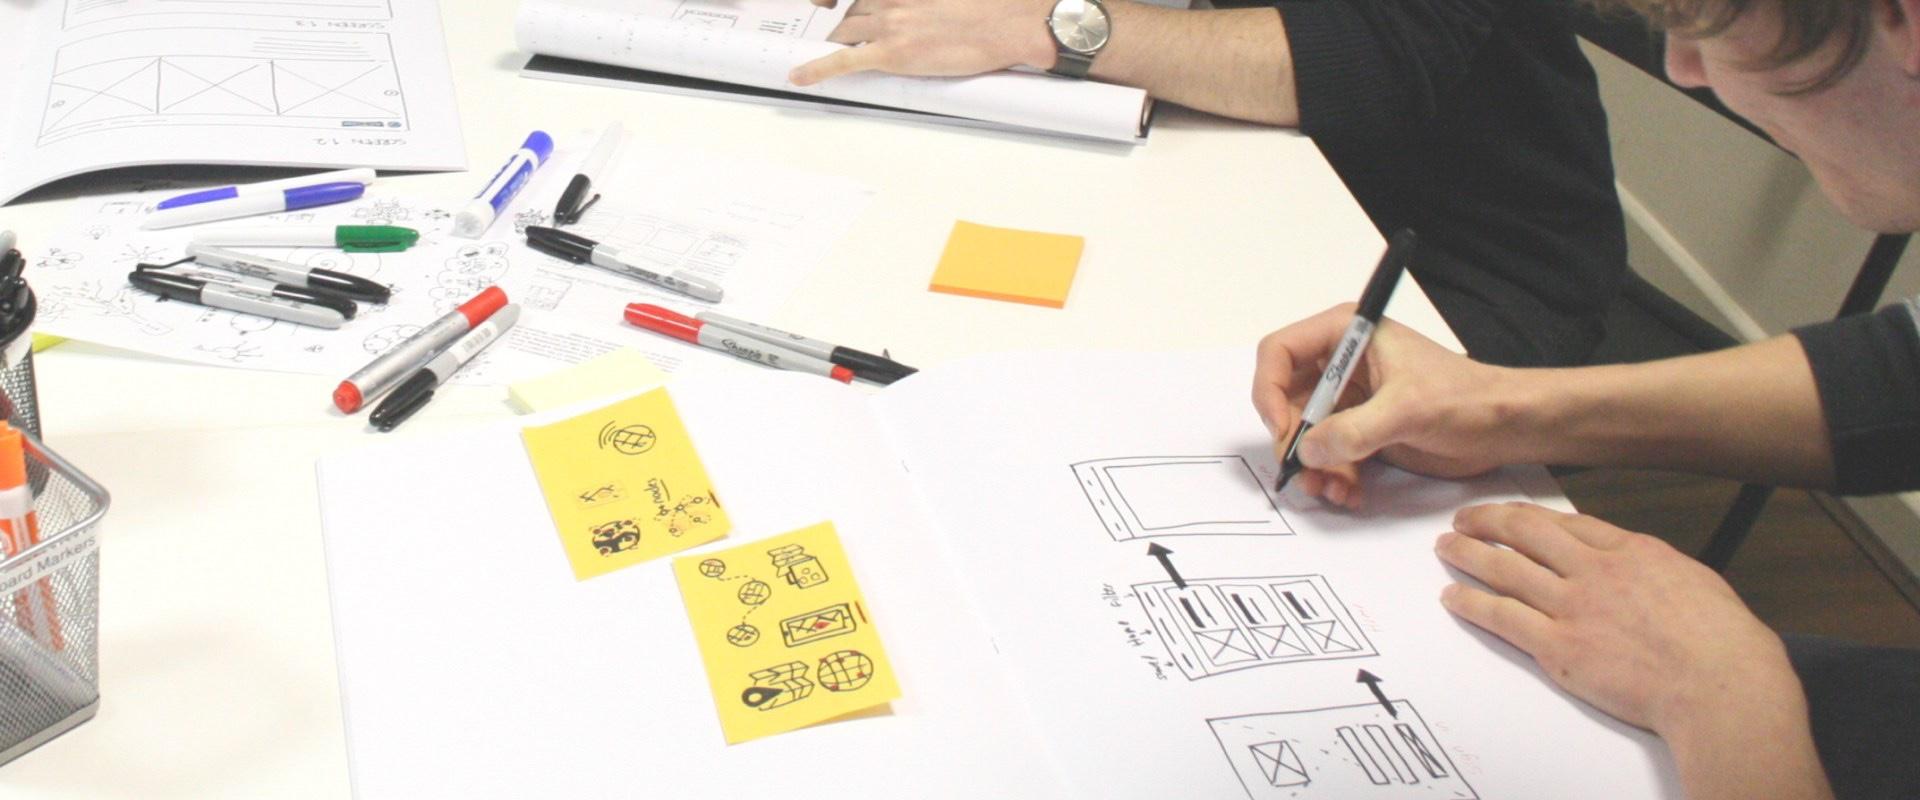 Paper-Prototyping-Sketching